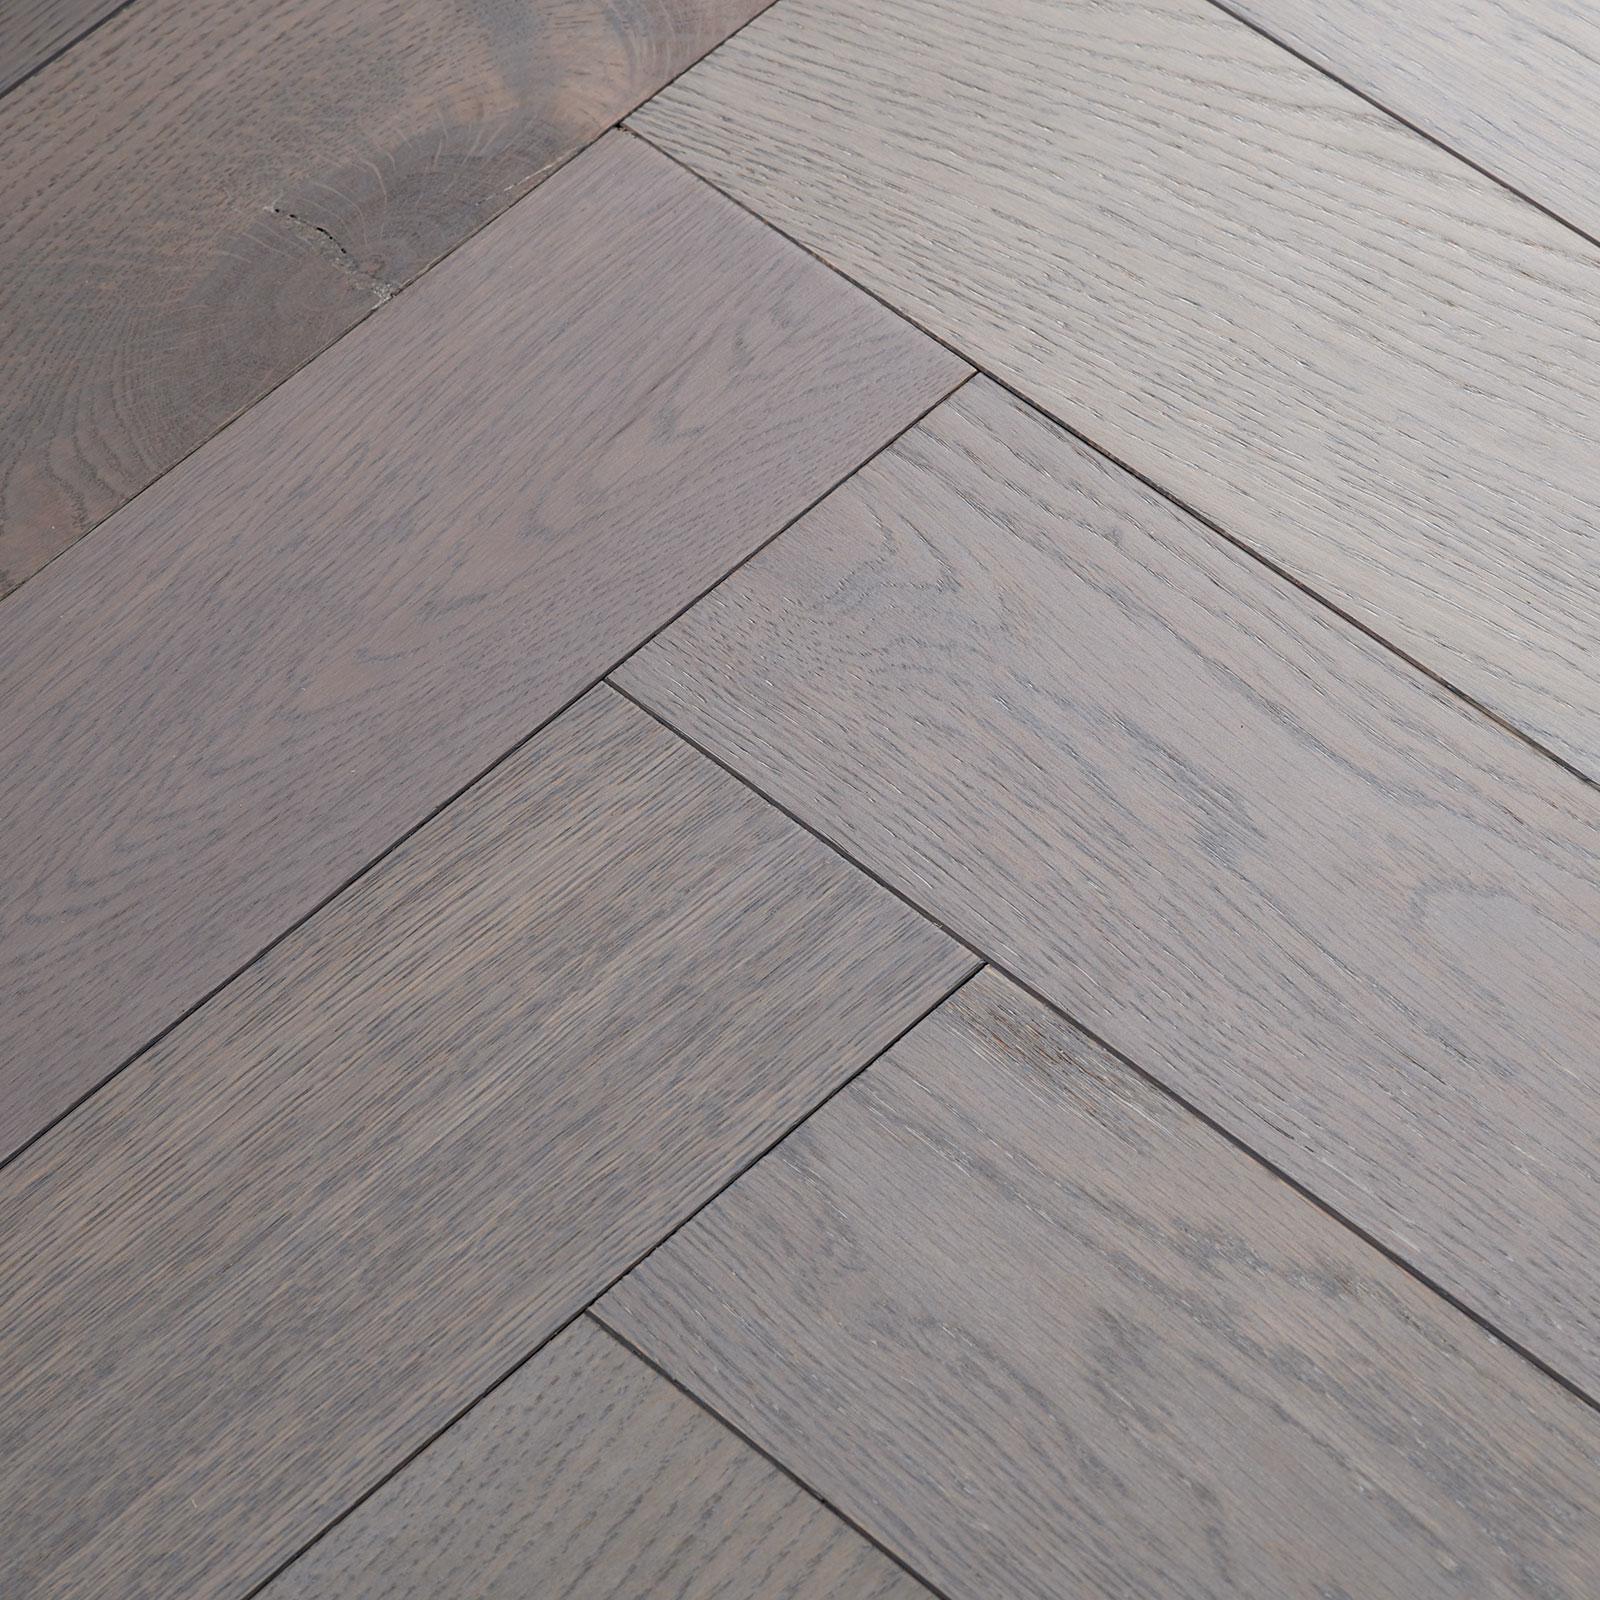 Goodrich Ash Oak Woodpecker Flooring Professional